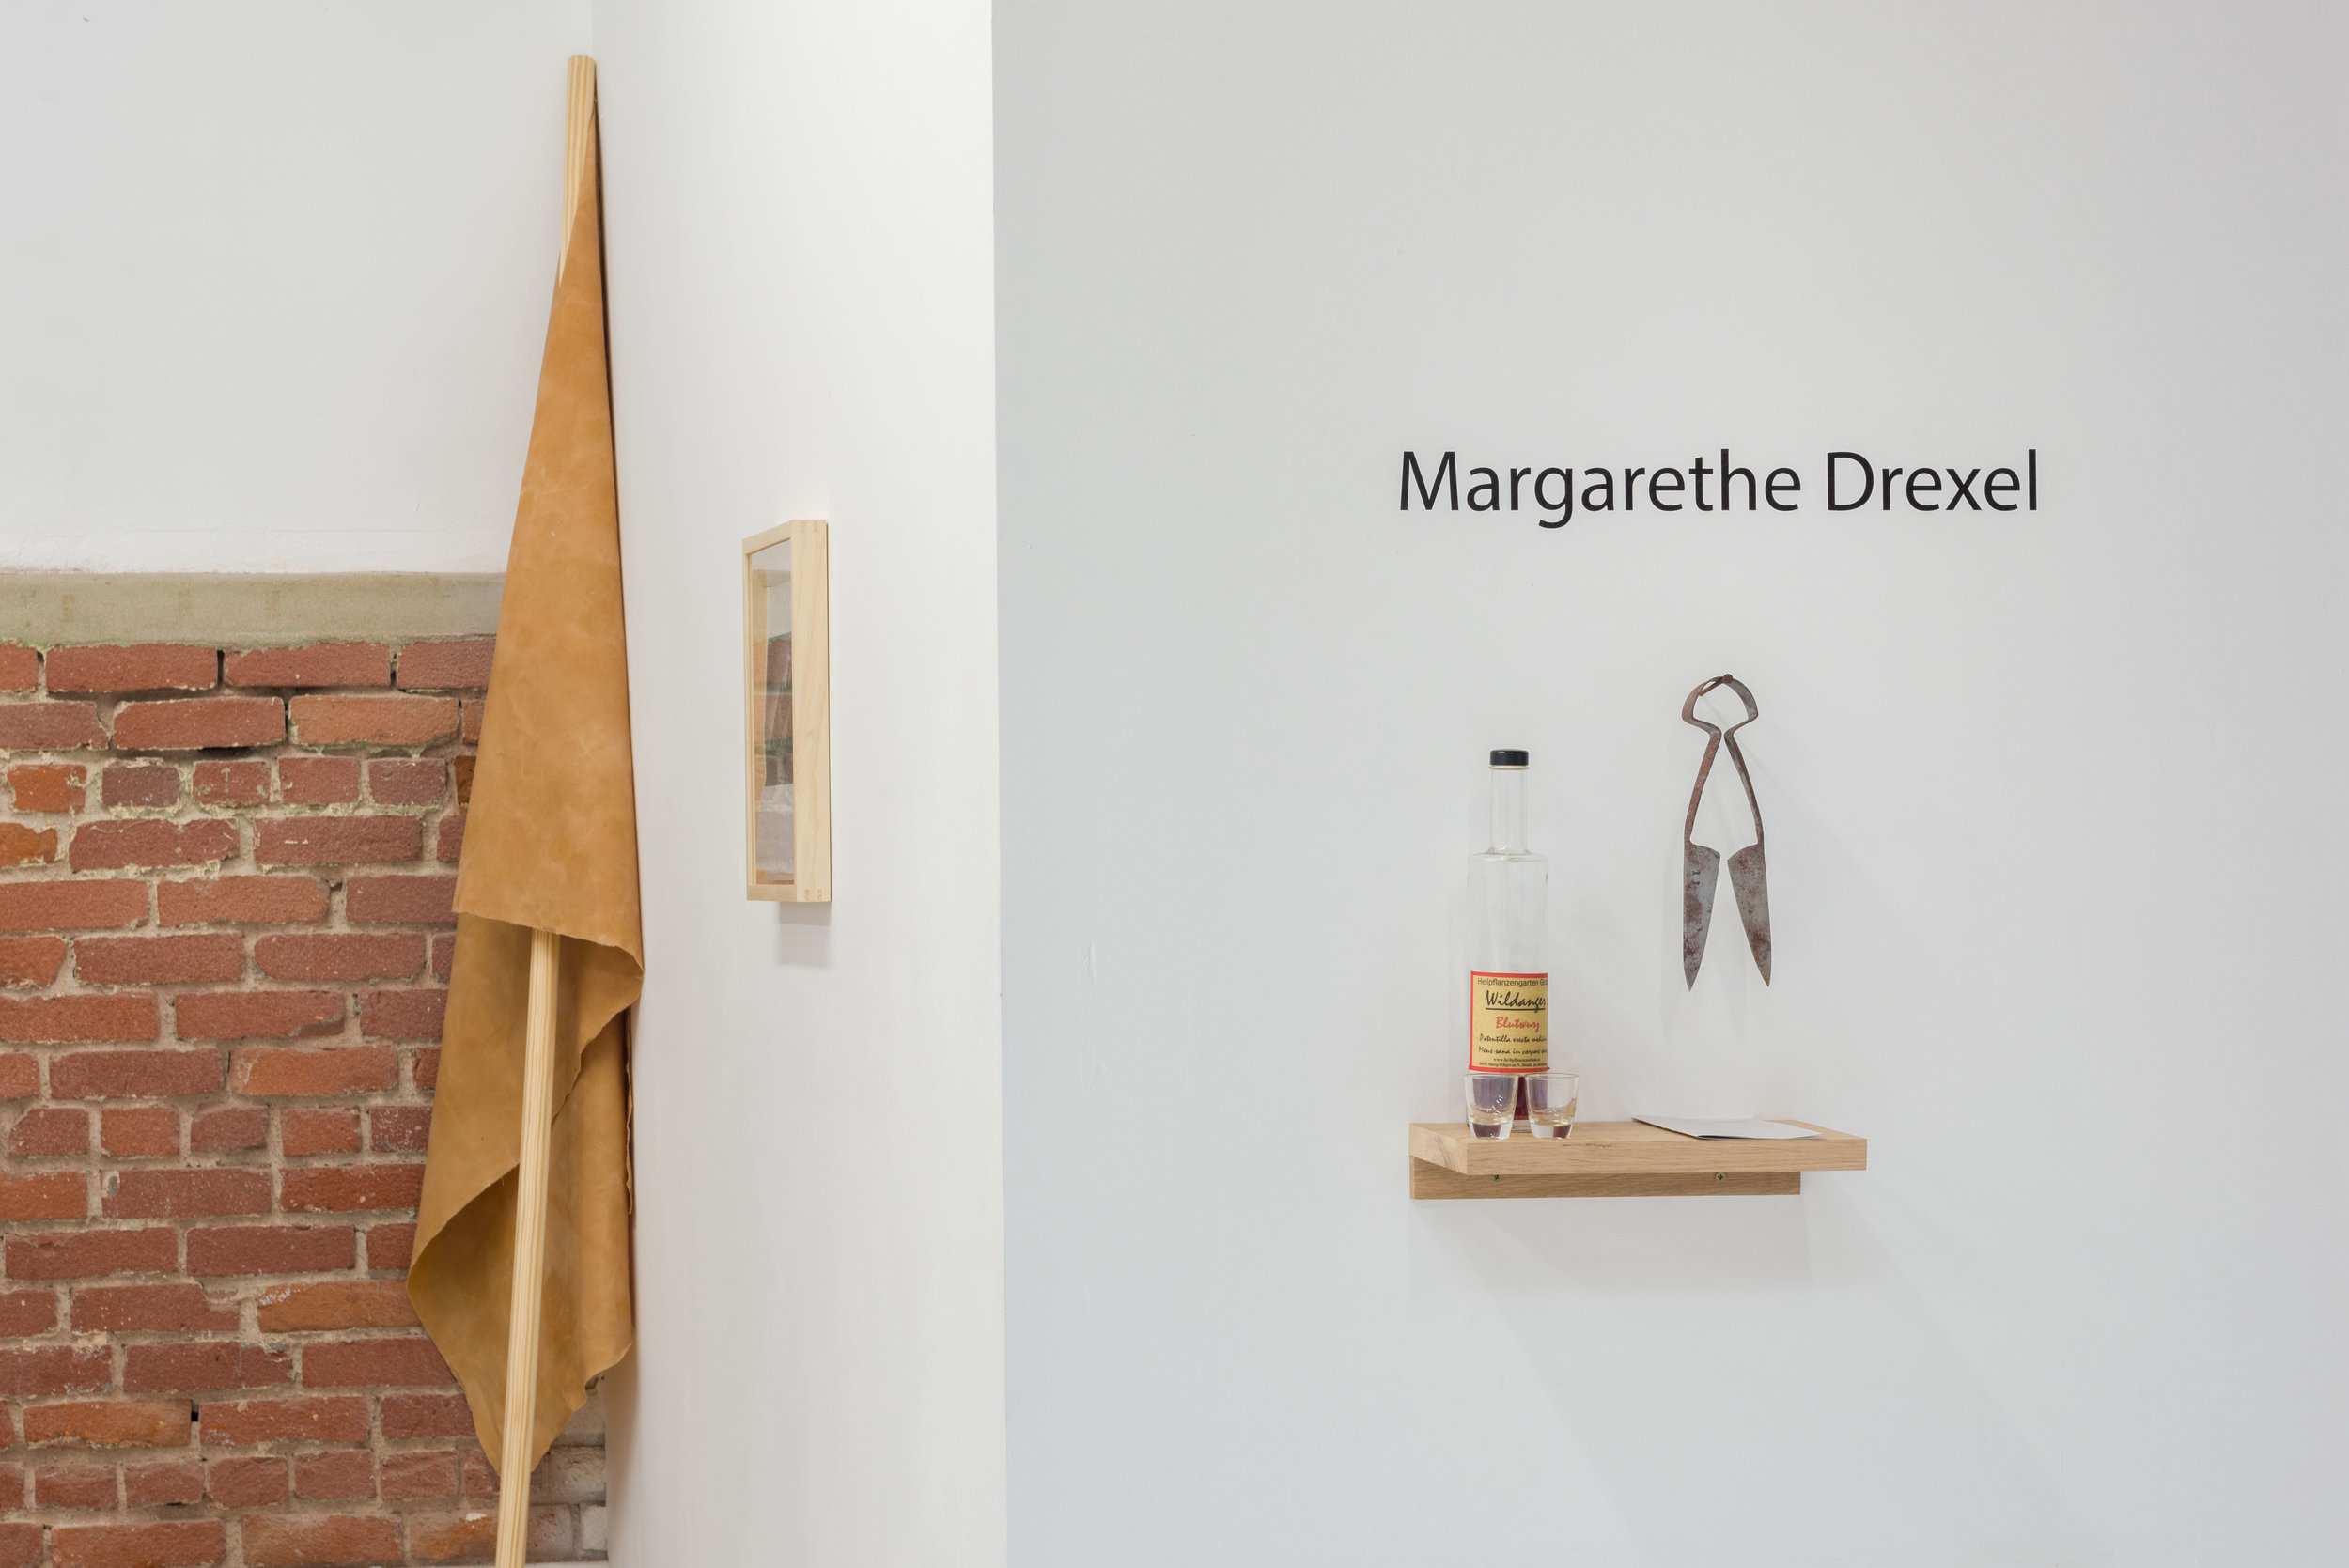 Margarethe Drexel, 'Potentilla erecta.Mens sana in corpore sano.' Installation view, Chimento Contemporary. Photo: Ruben Diaz.